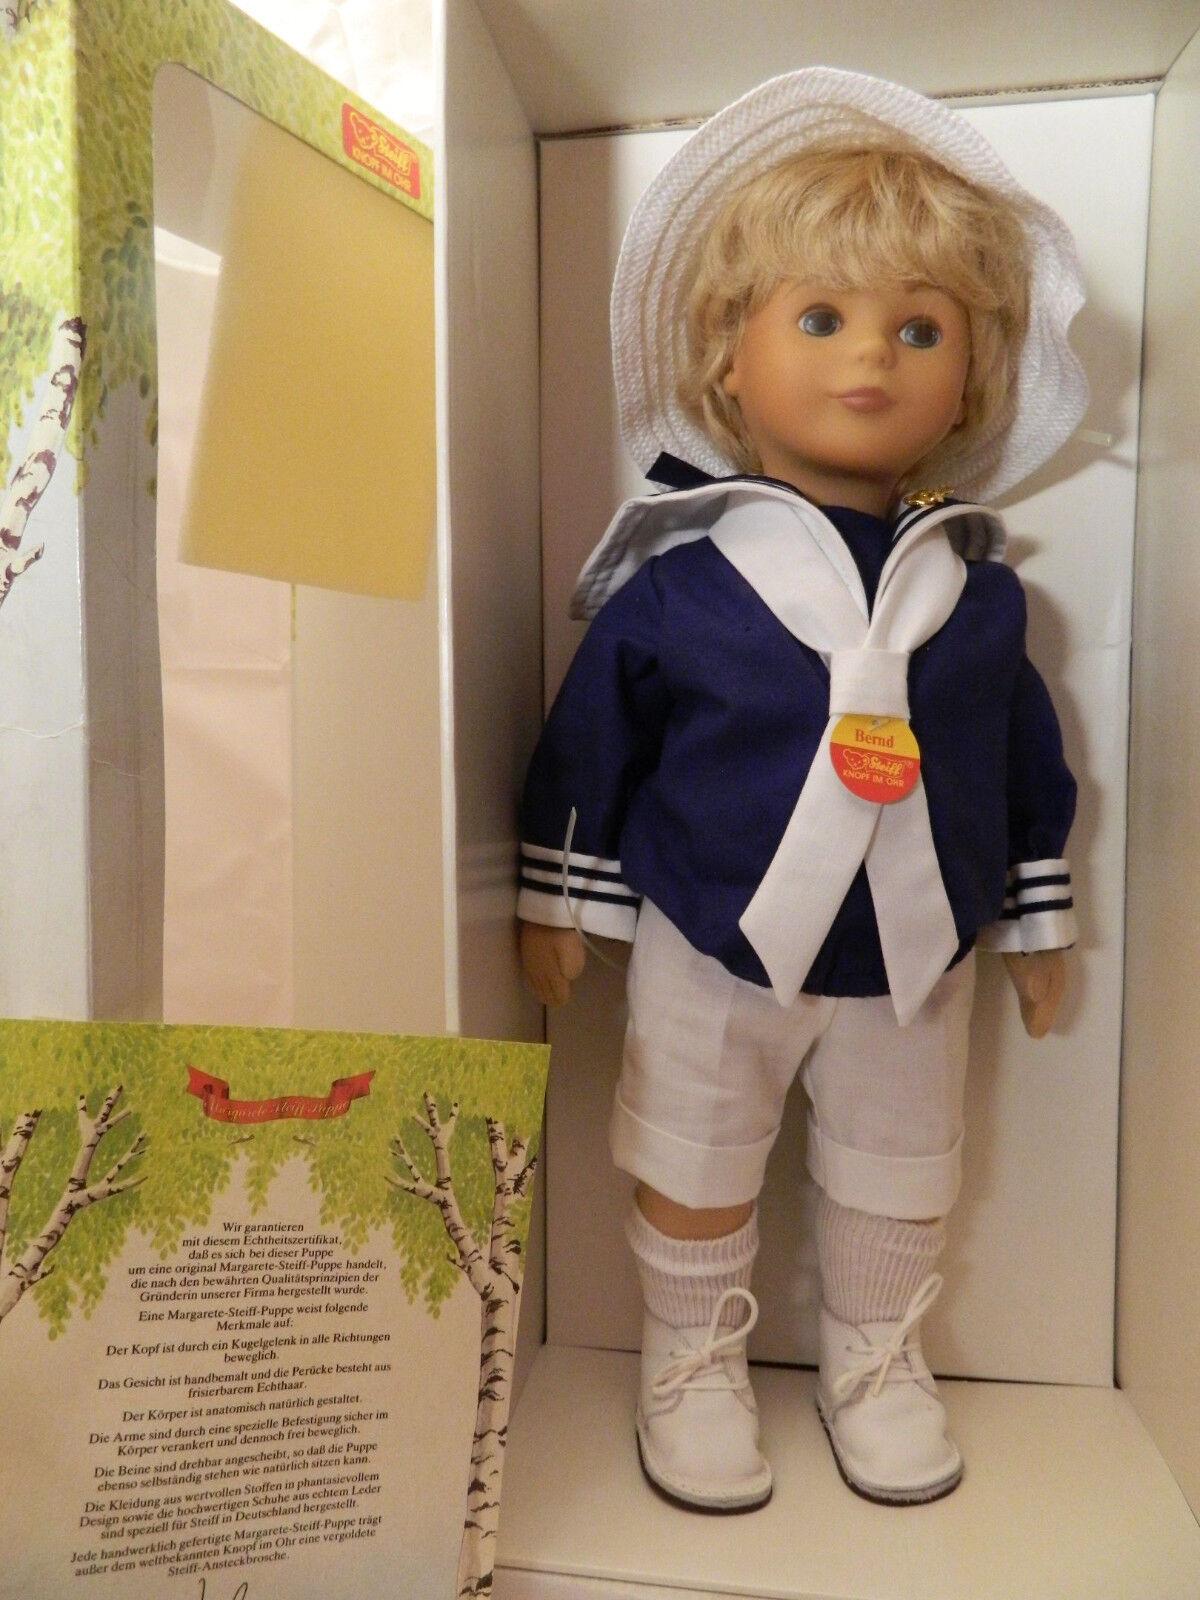 Steiff Puppe Bernd - 1987 - Nr. 9210 9210 9210 42 - Stoffpuppe - 42 cm 846714